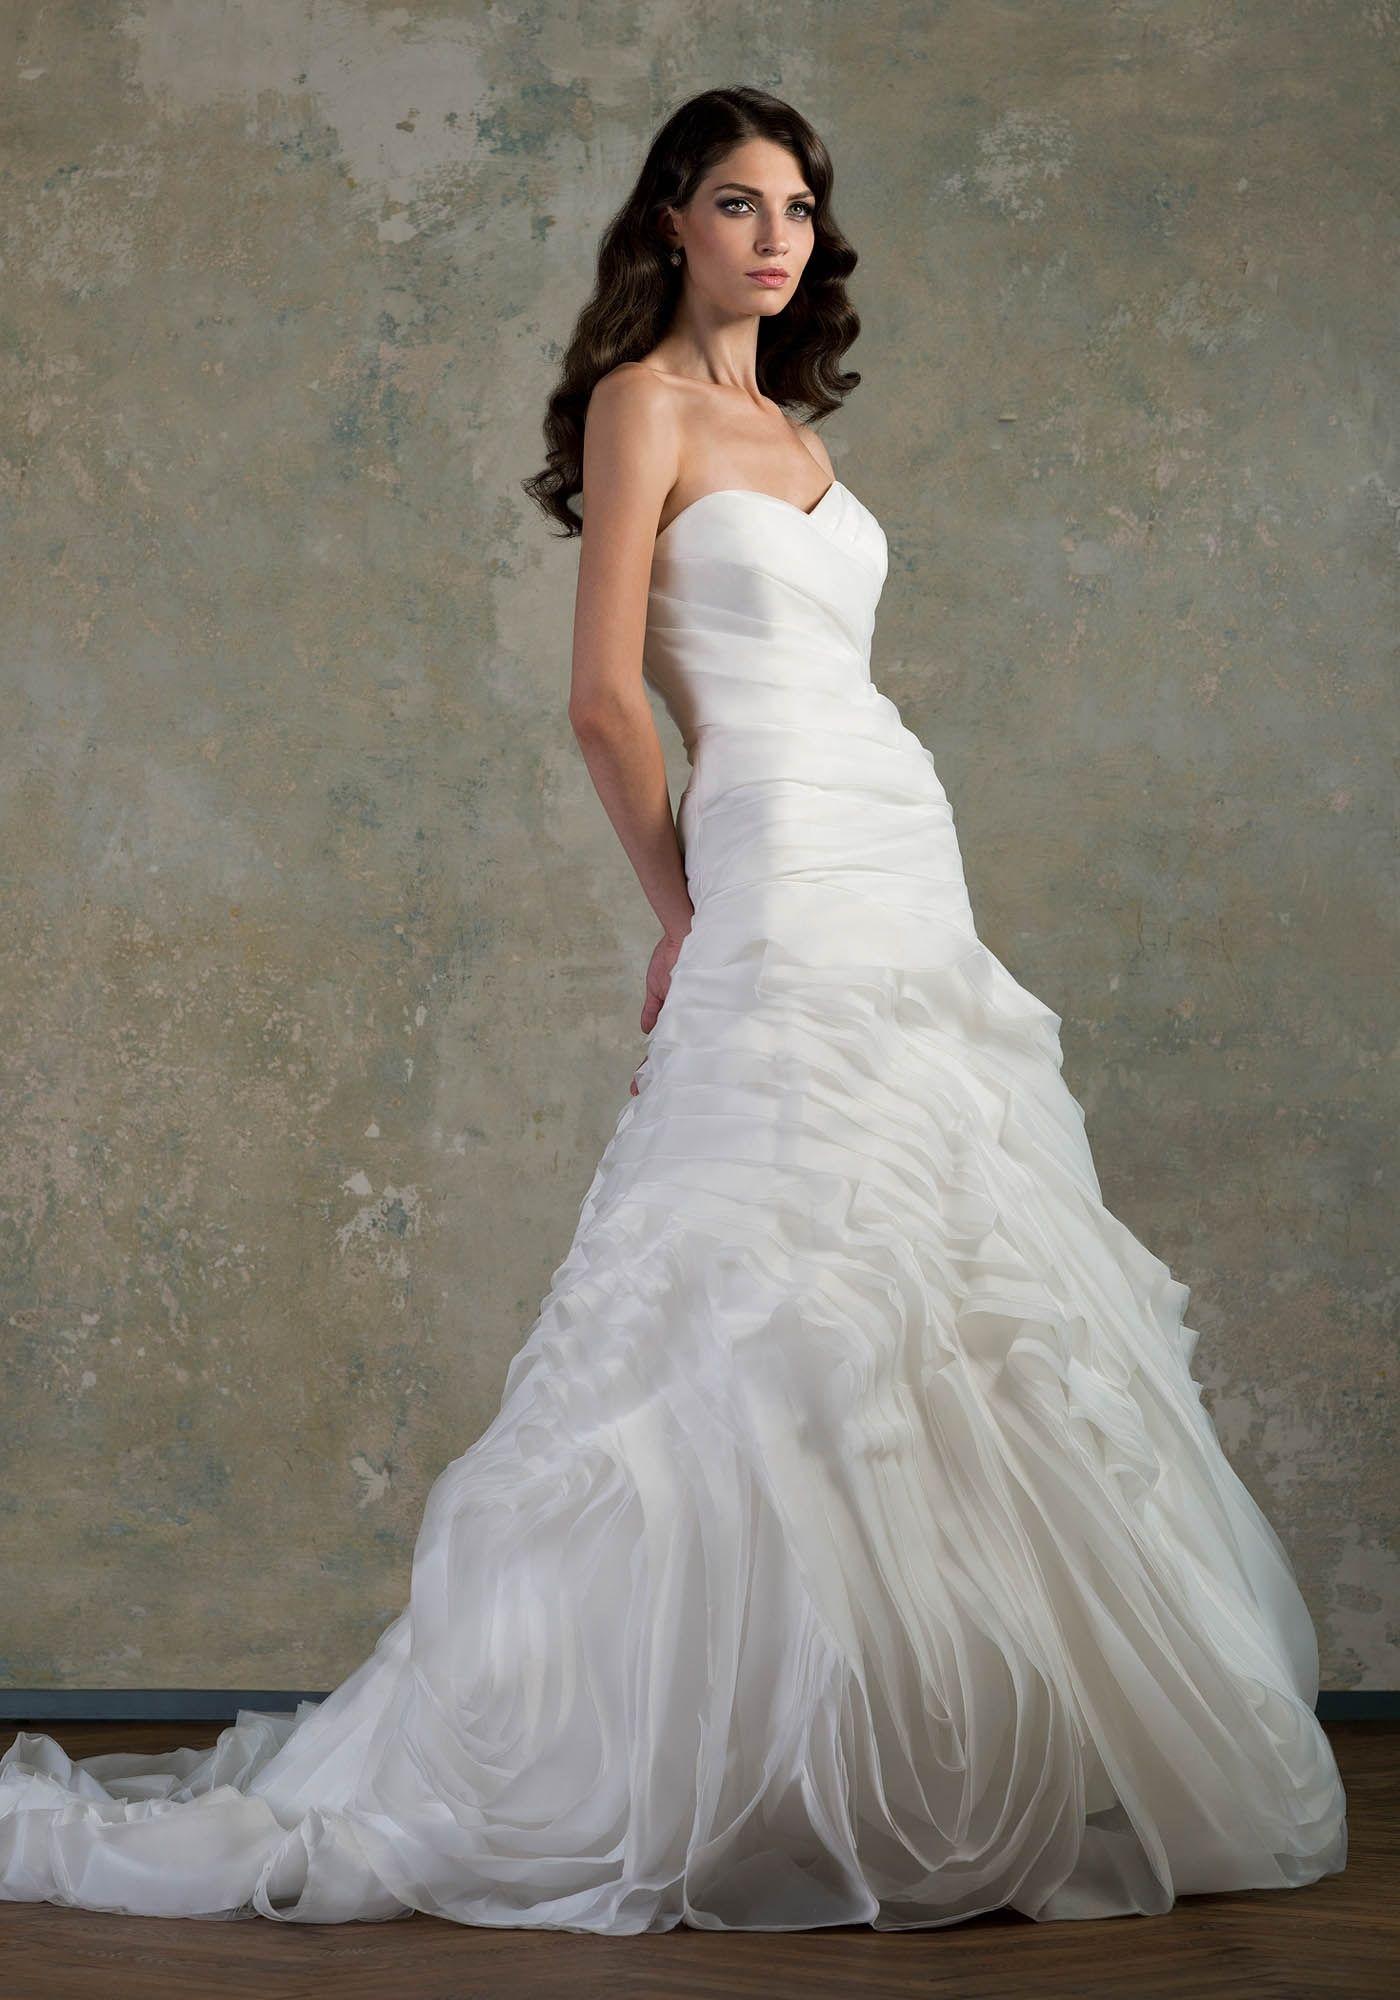 heart shaped wedding dress FIRST LOVE low waist heart shaped bodice ruffled wedding dress with long train